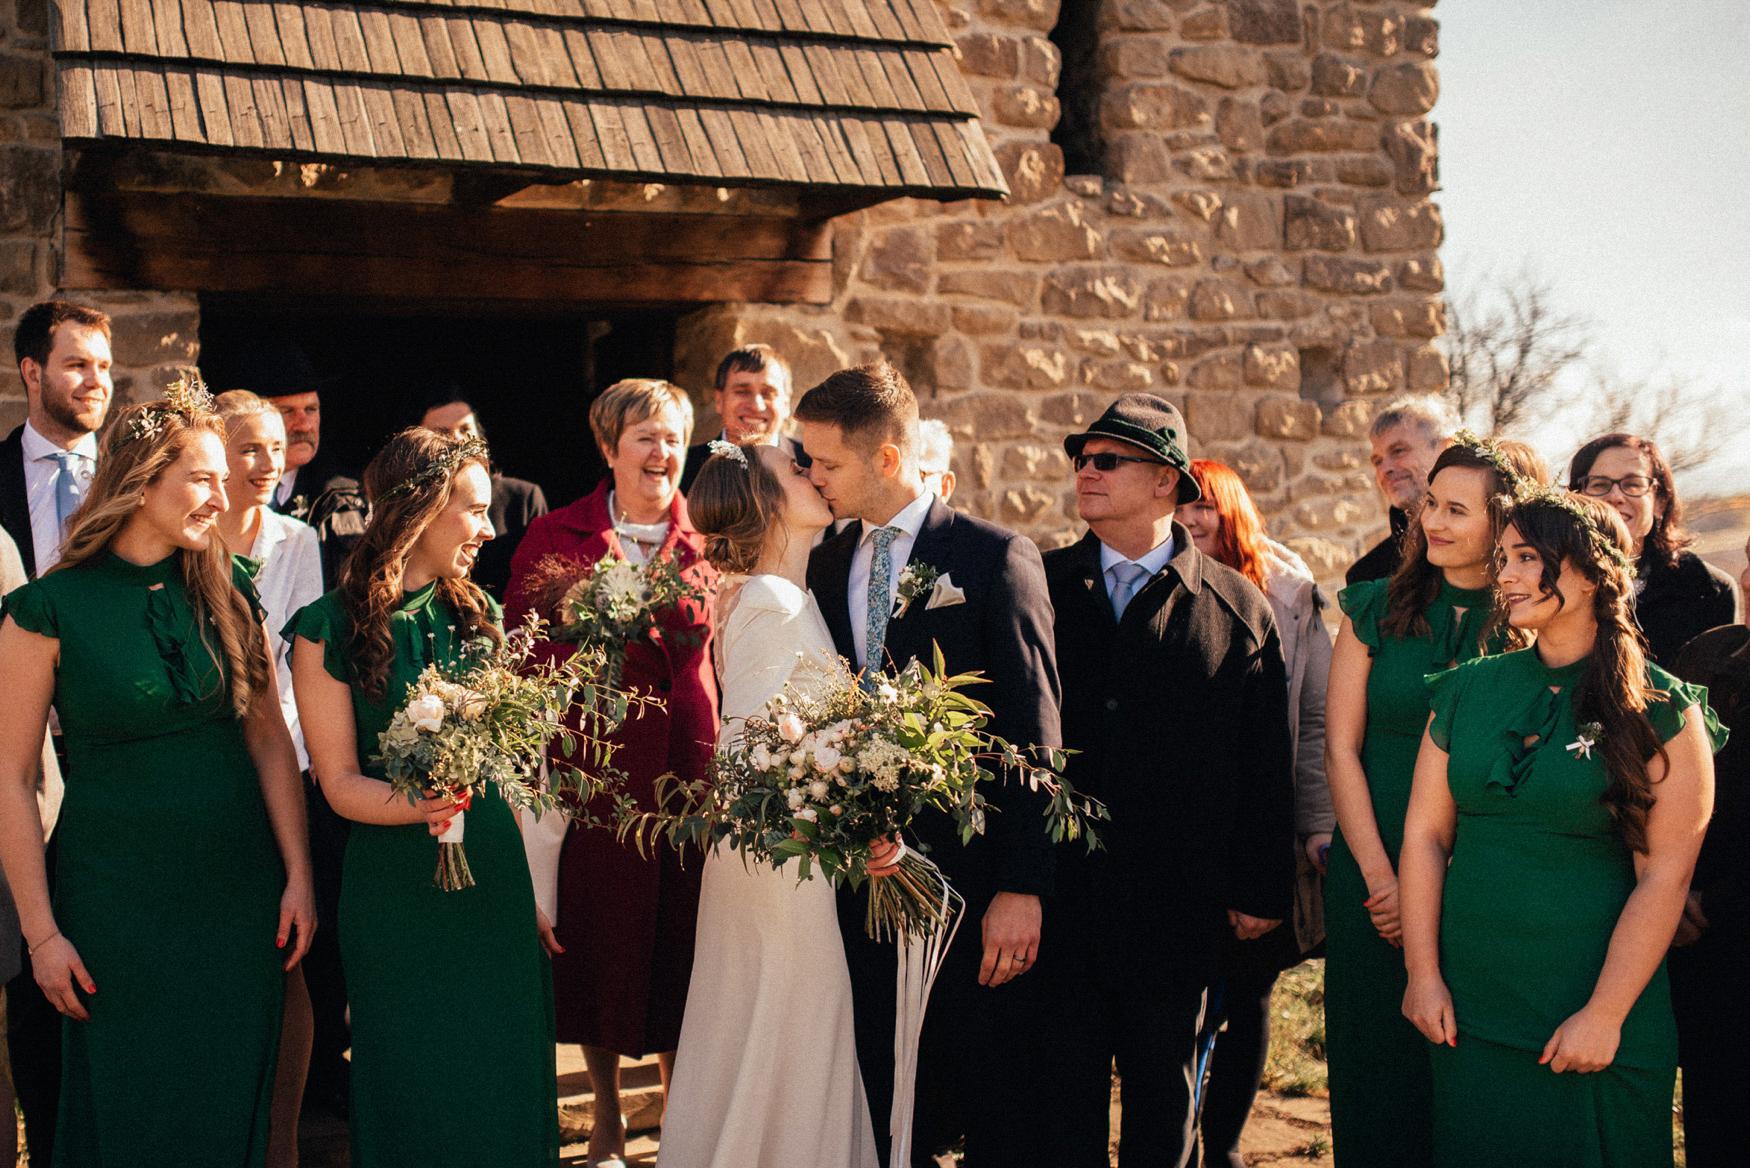 2 prague wedding photographer - boho svatba zikmundov031.jpg